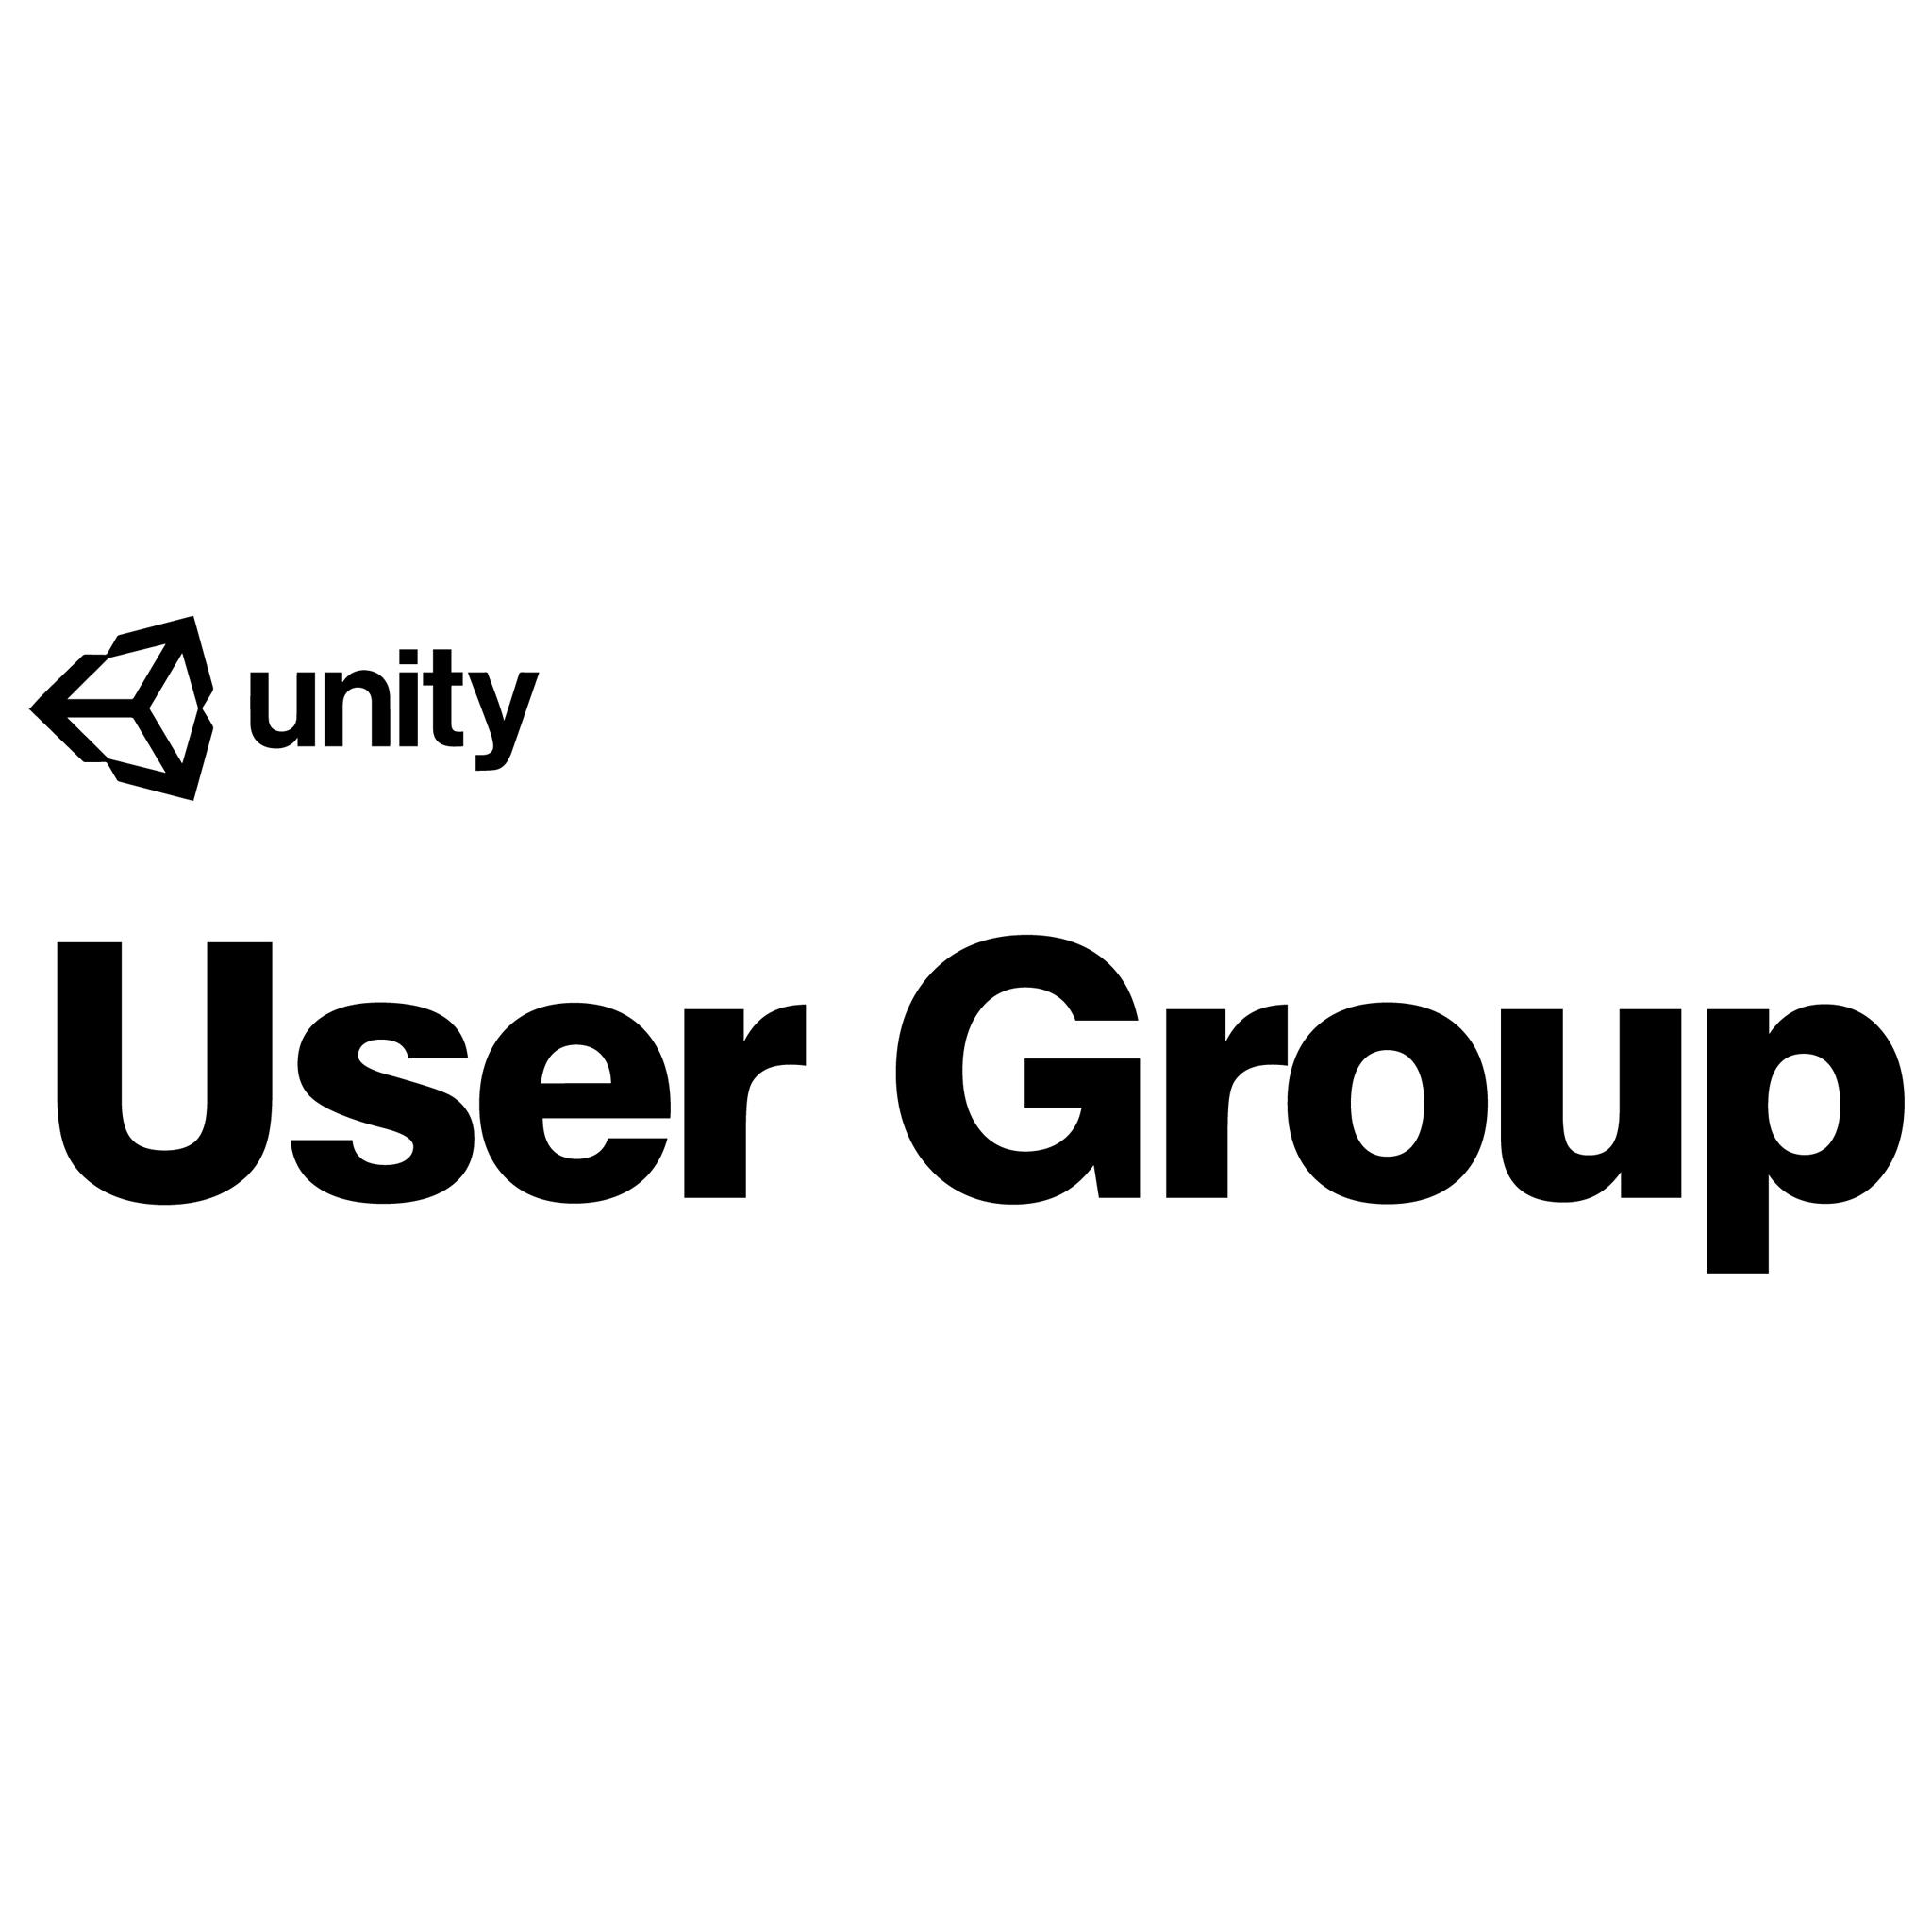 UUG武汉站-Unity分享会